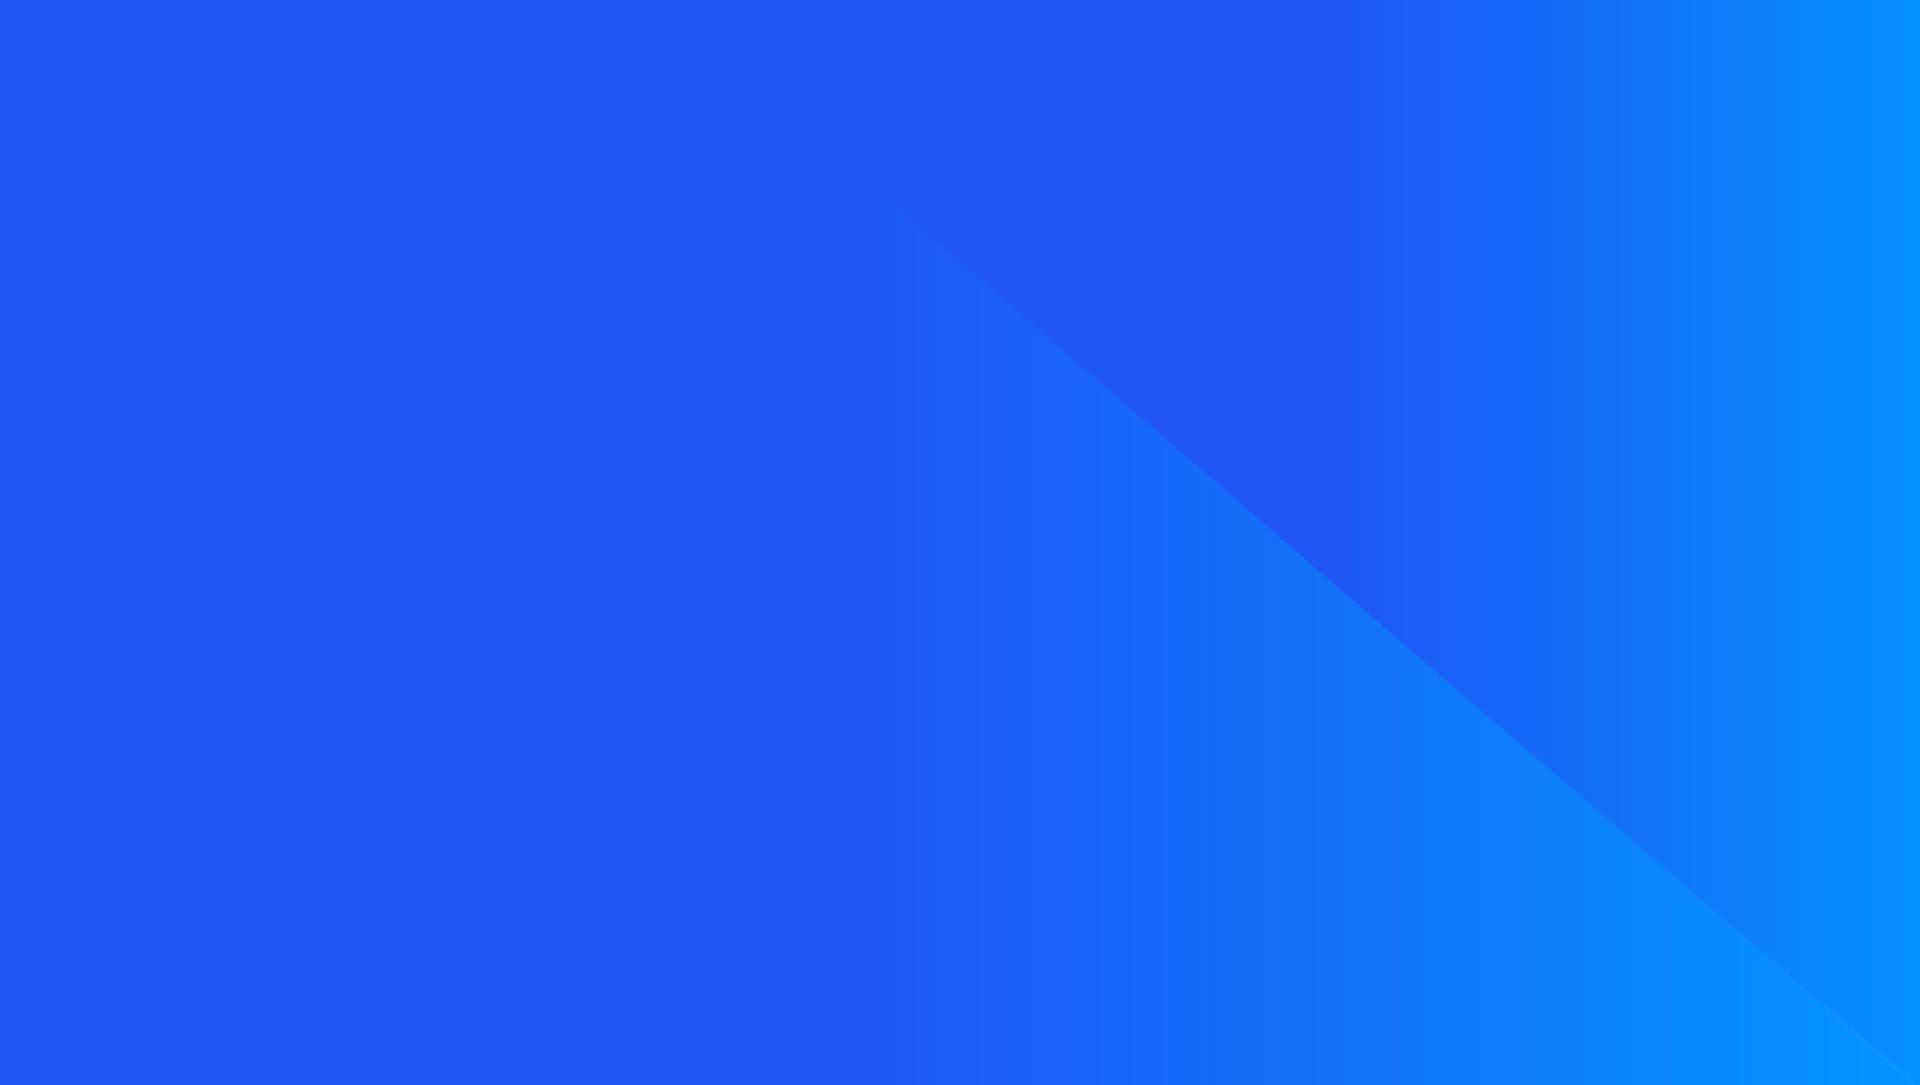 bg-purplish-gradient